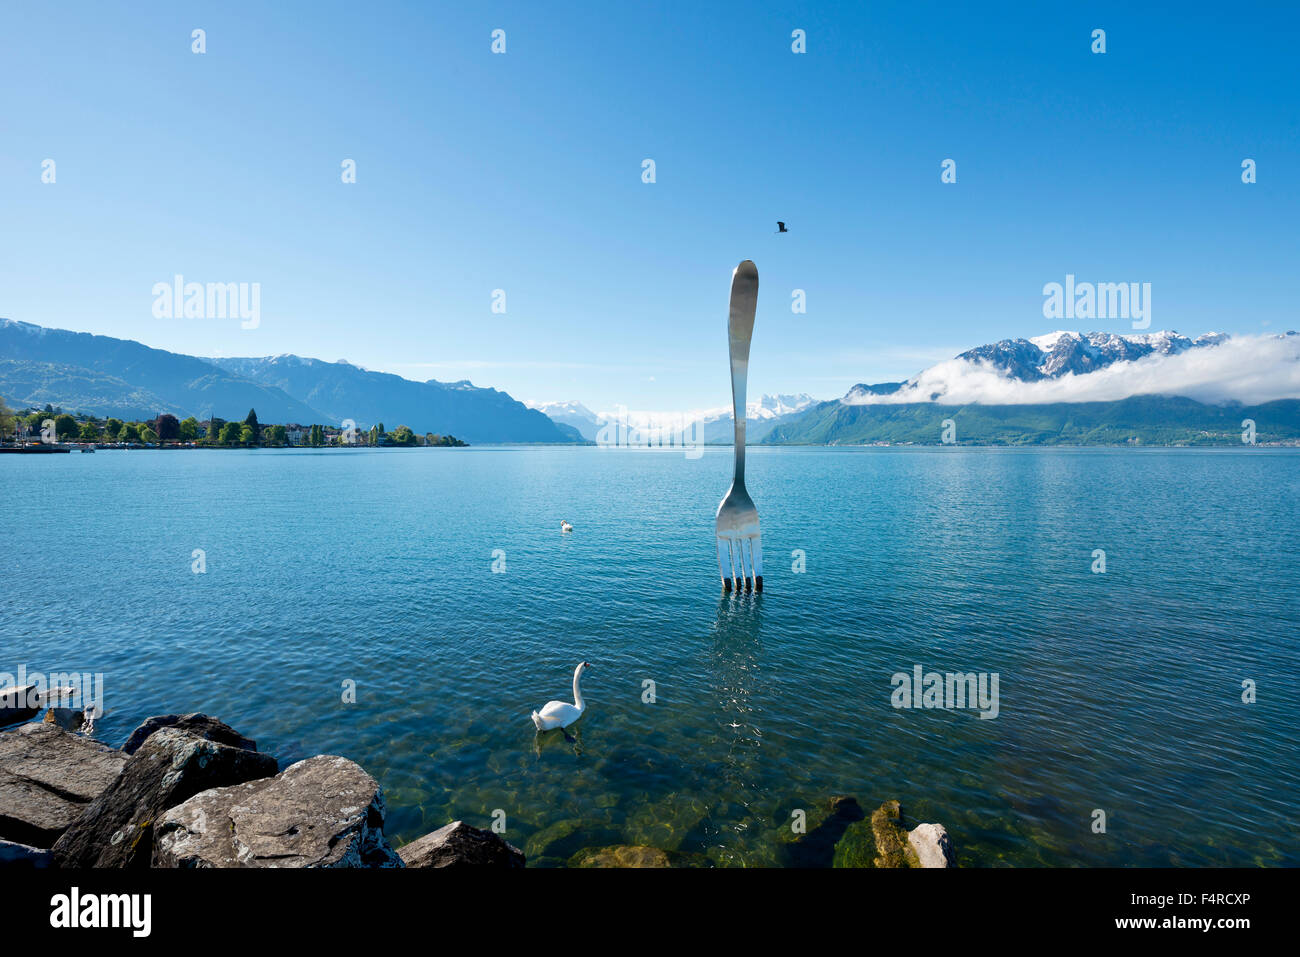 Switzerland, town, city, Fourchette, fork, Jean-Pierre Zaugg, Vaud, VD, Vevey, Lac Léman, lake Geneva, lake, - Stock Image